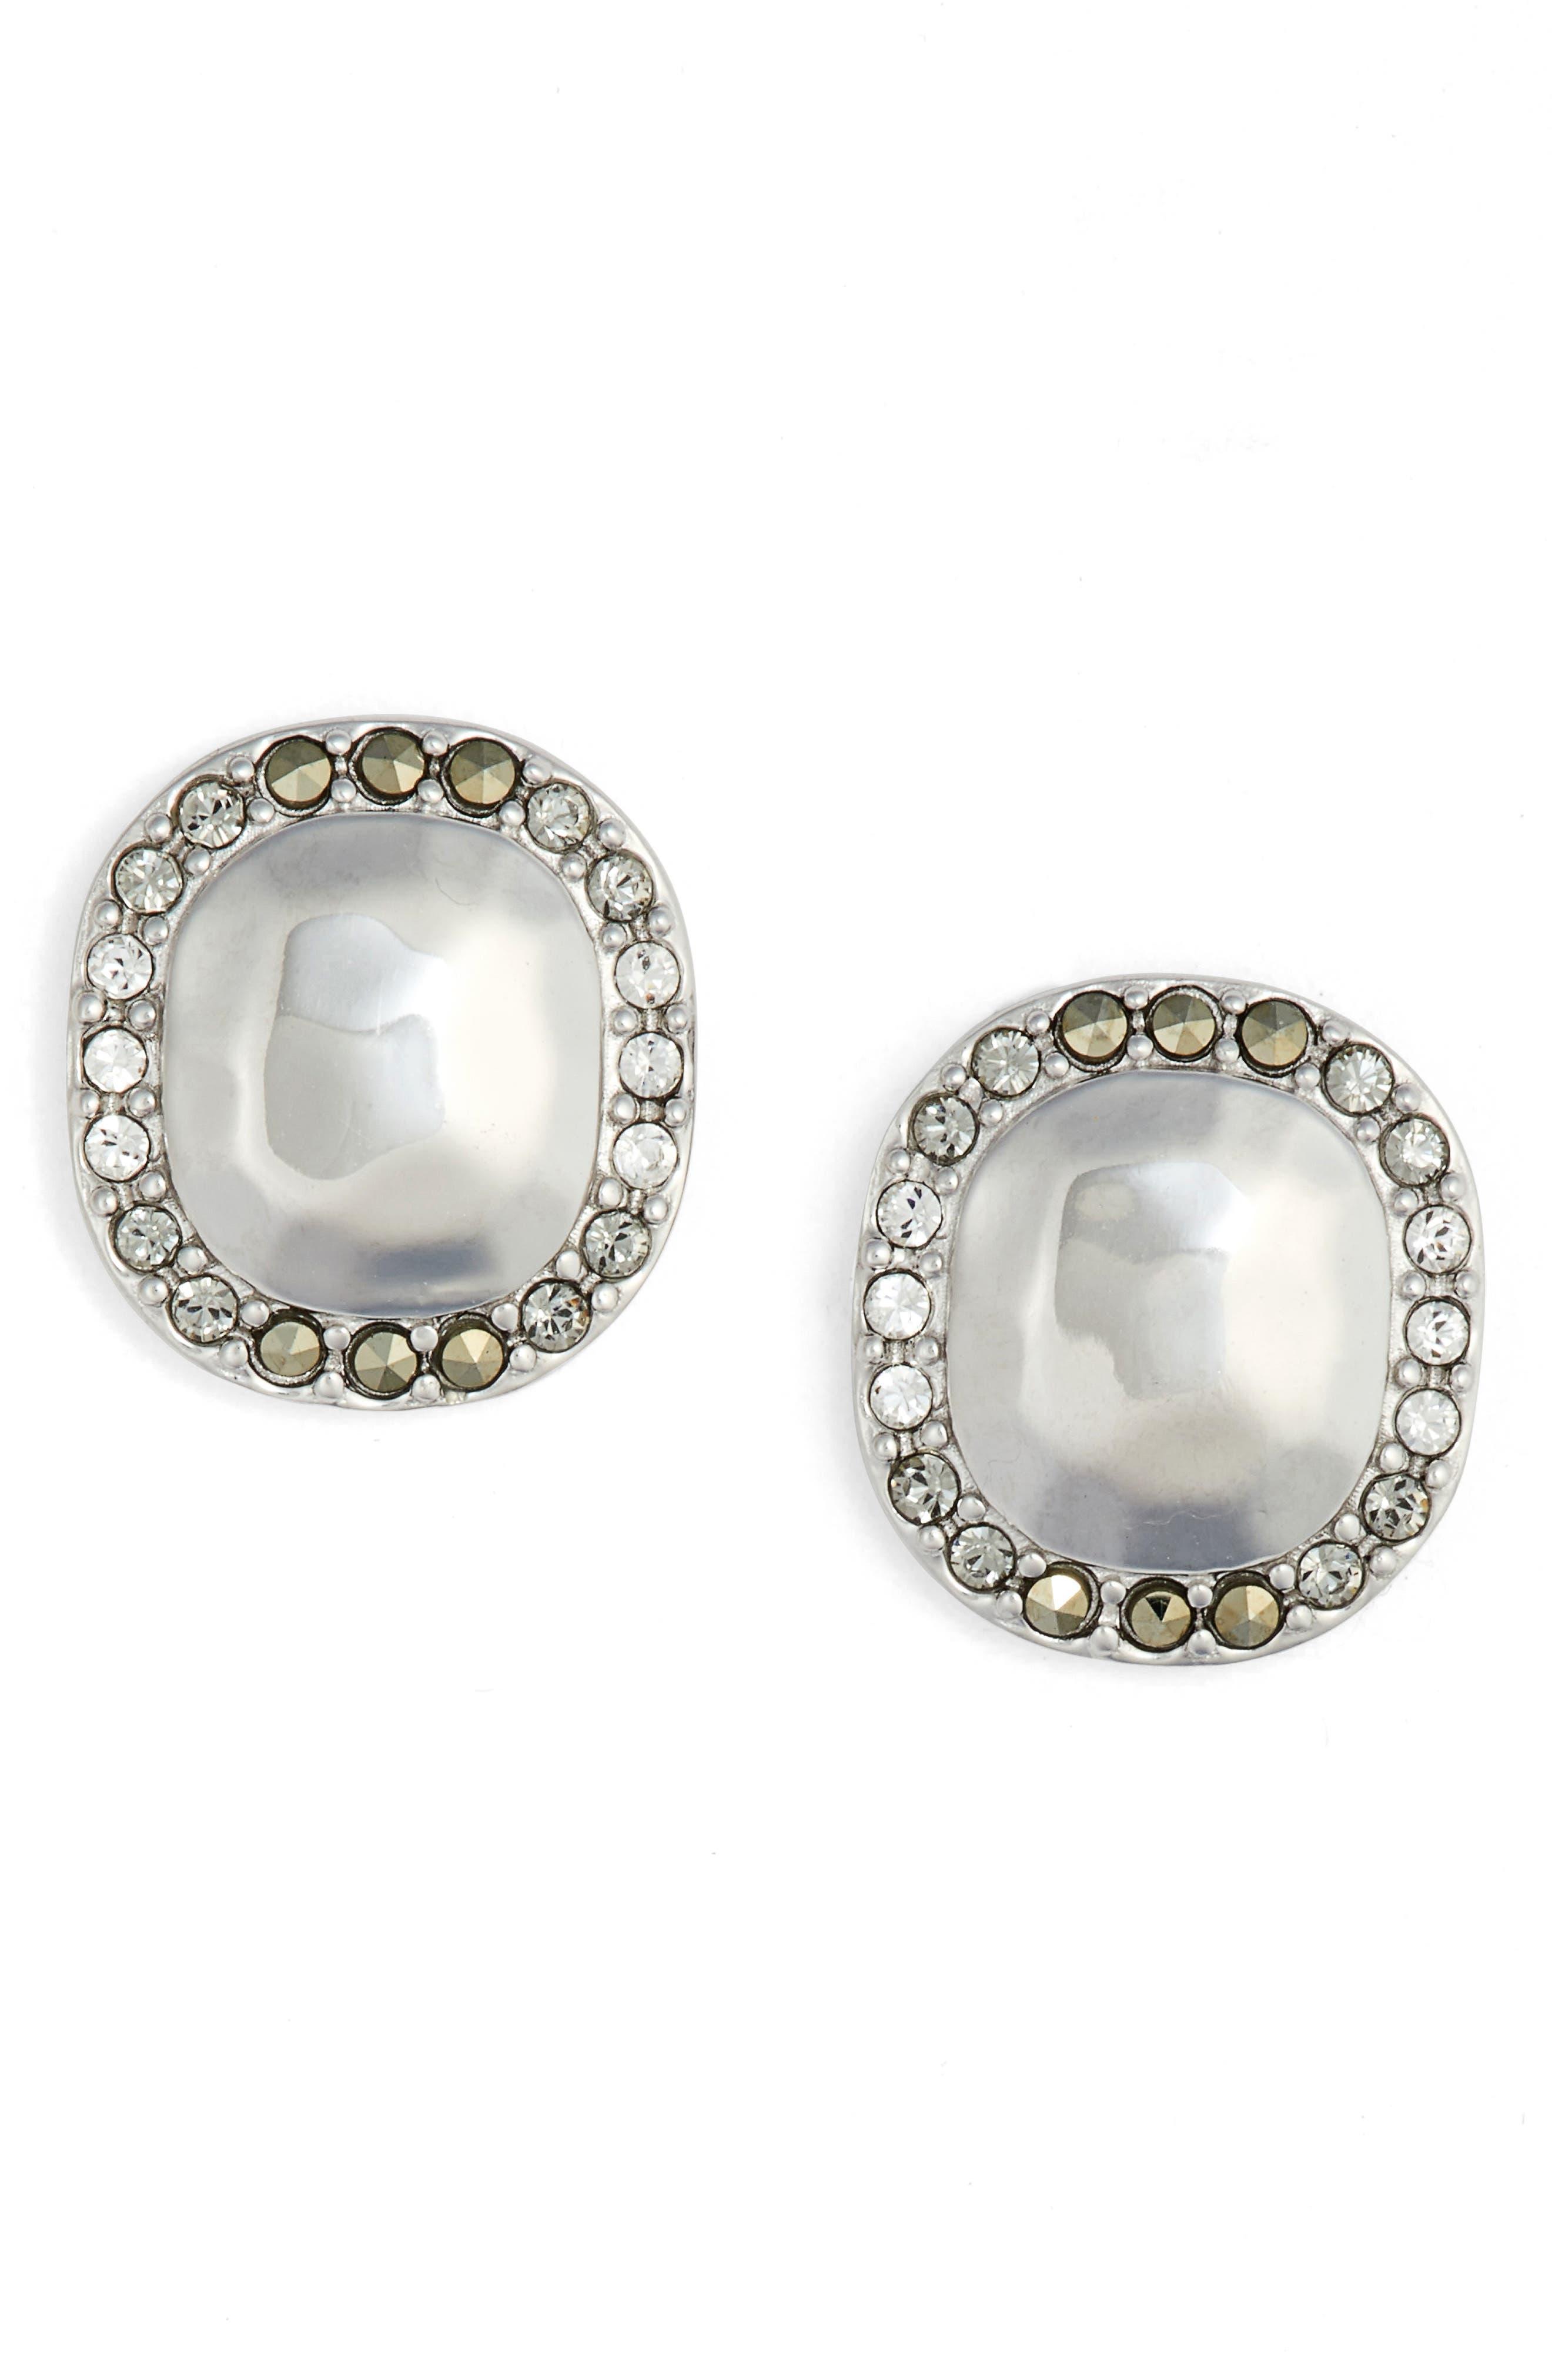 Jewel Stud Earrings,                         Main,                         color, Silver